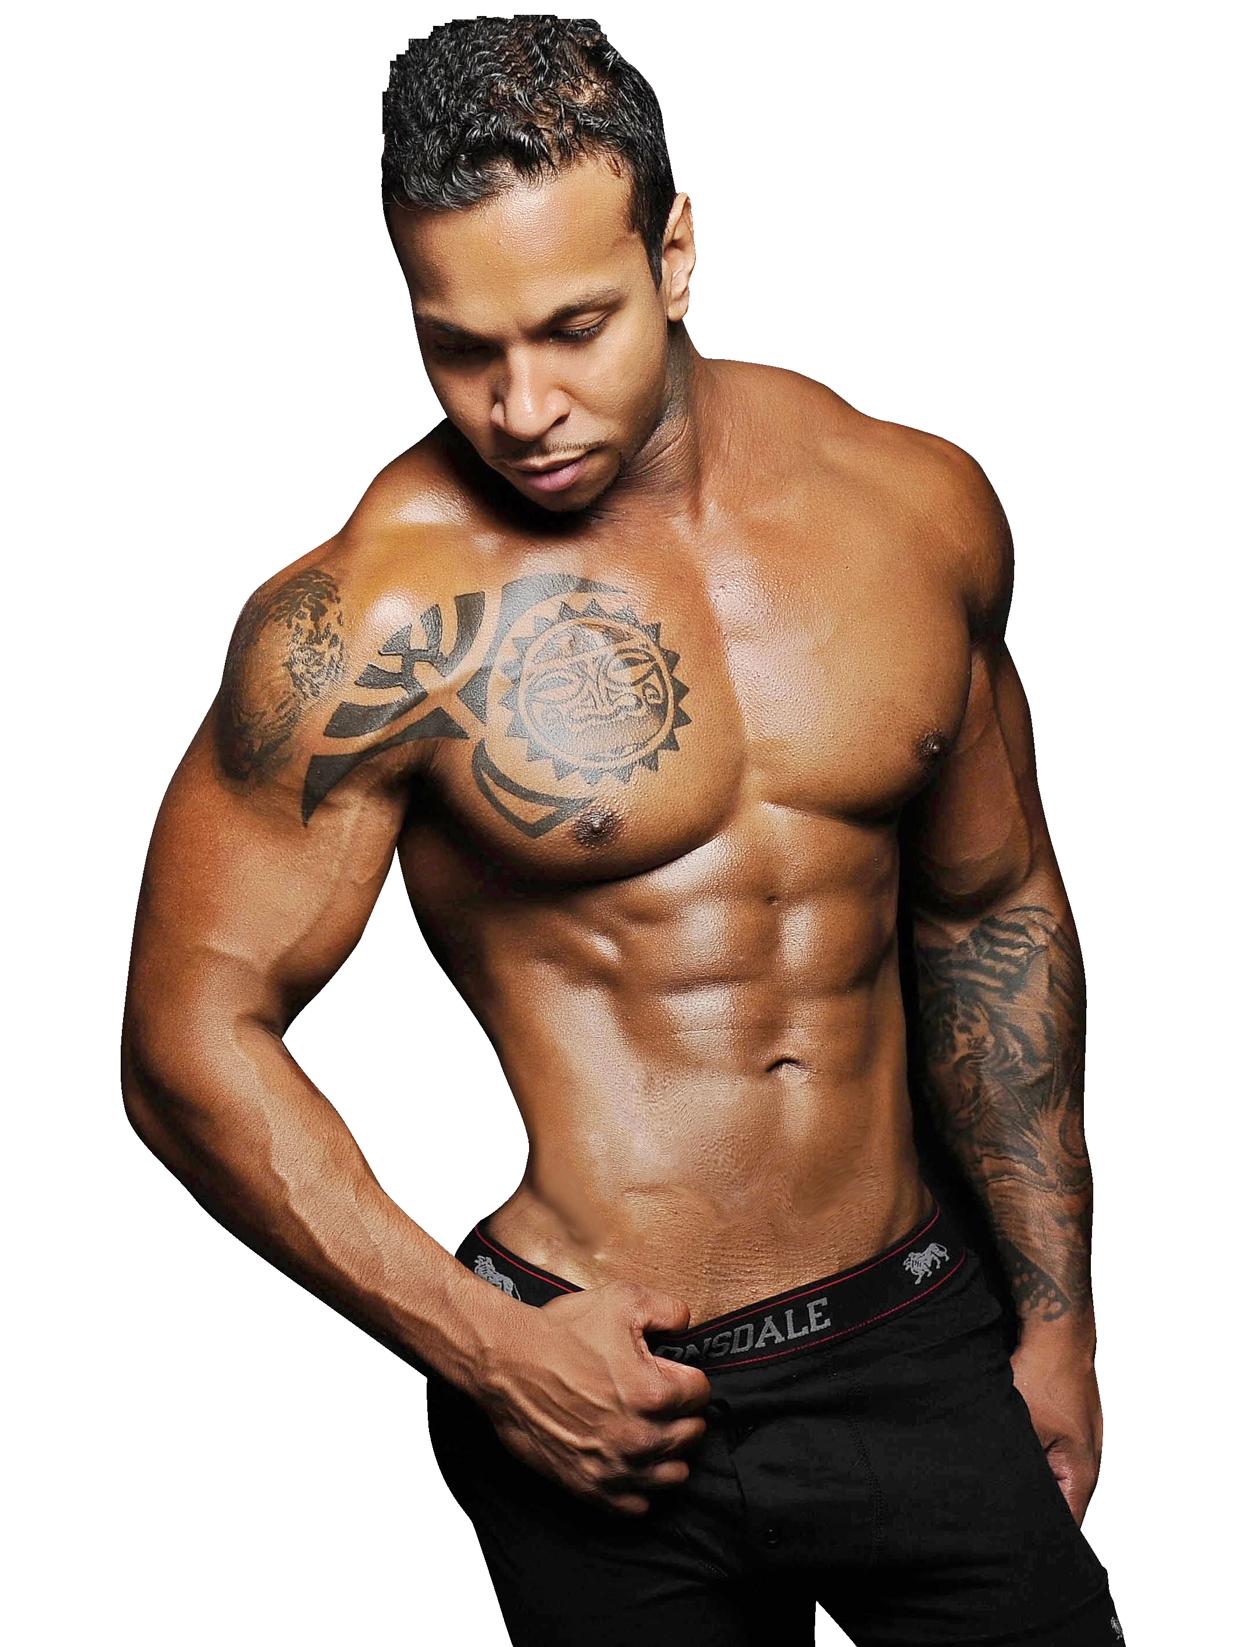 Dumbbell clipart male fitness. Png images pngpix men